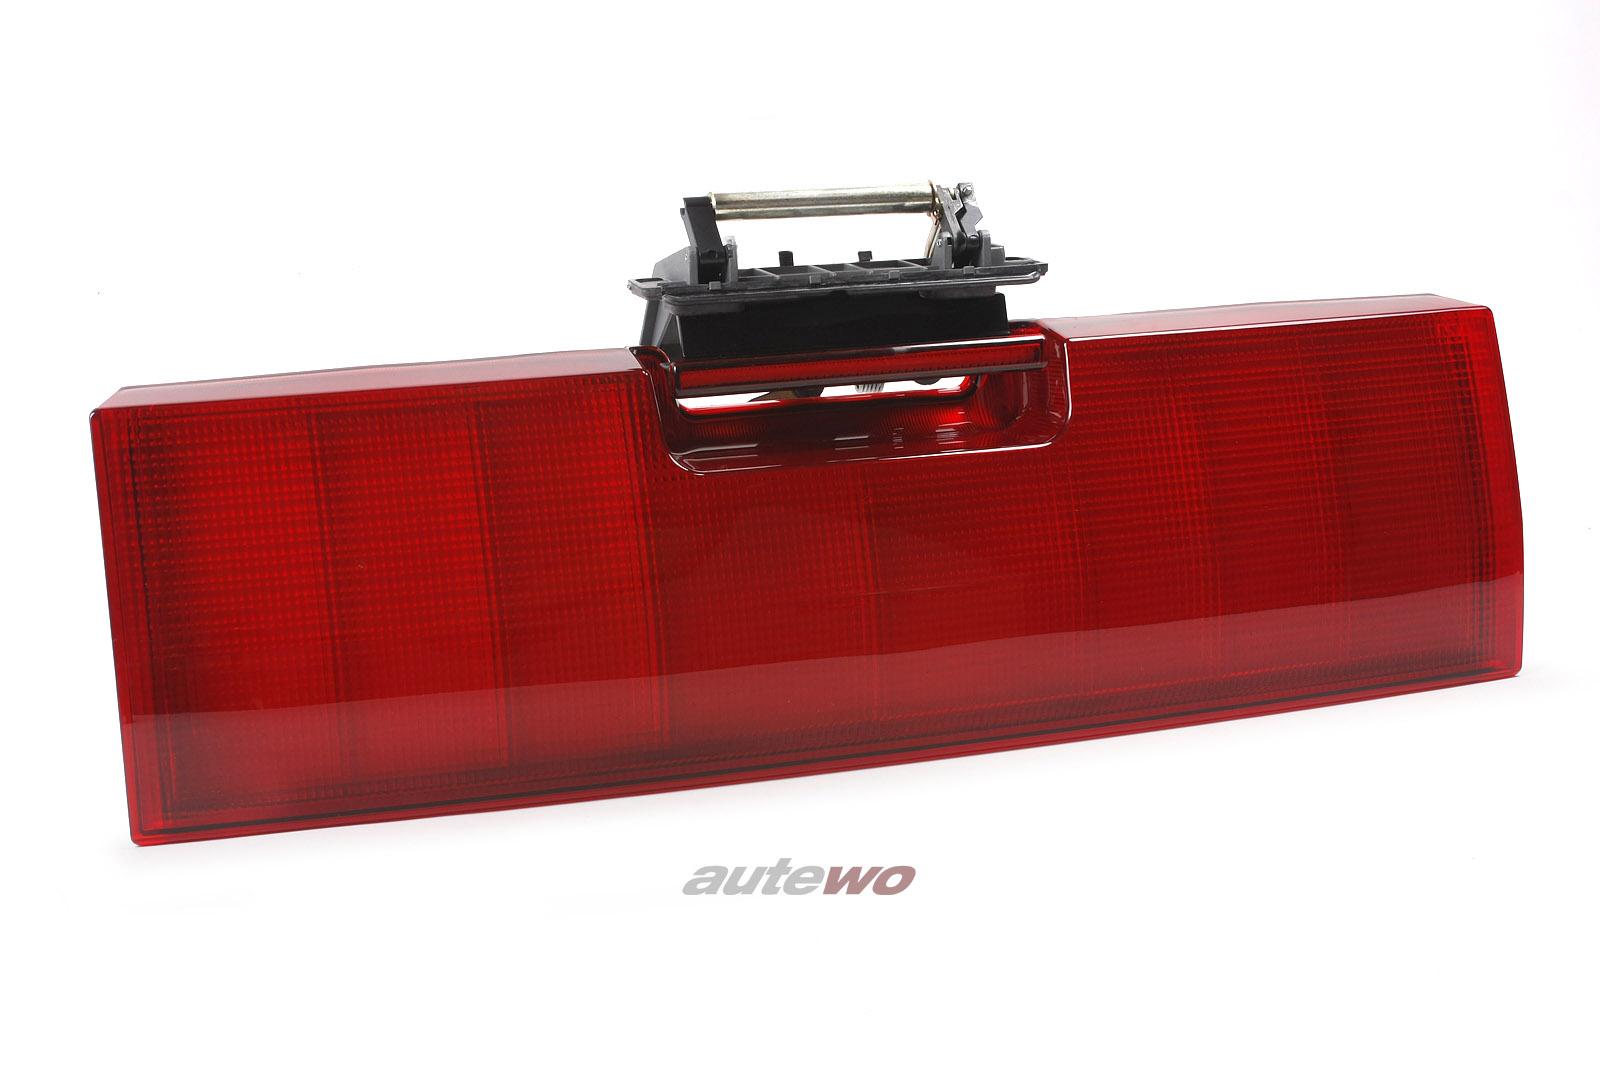 8A9853489B & 4A9827565E NEU Audi RS2 P1 Heckklappenblende mit Griff rot